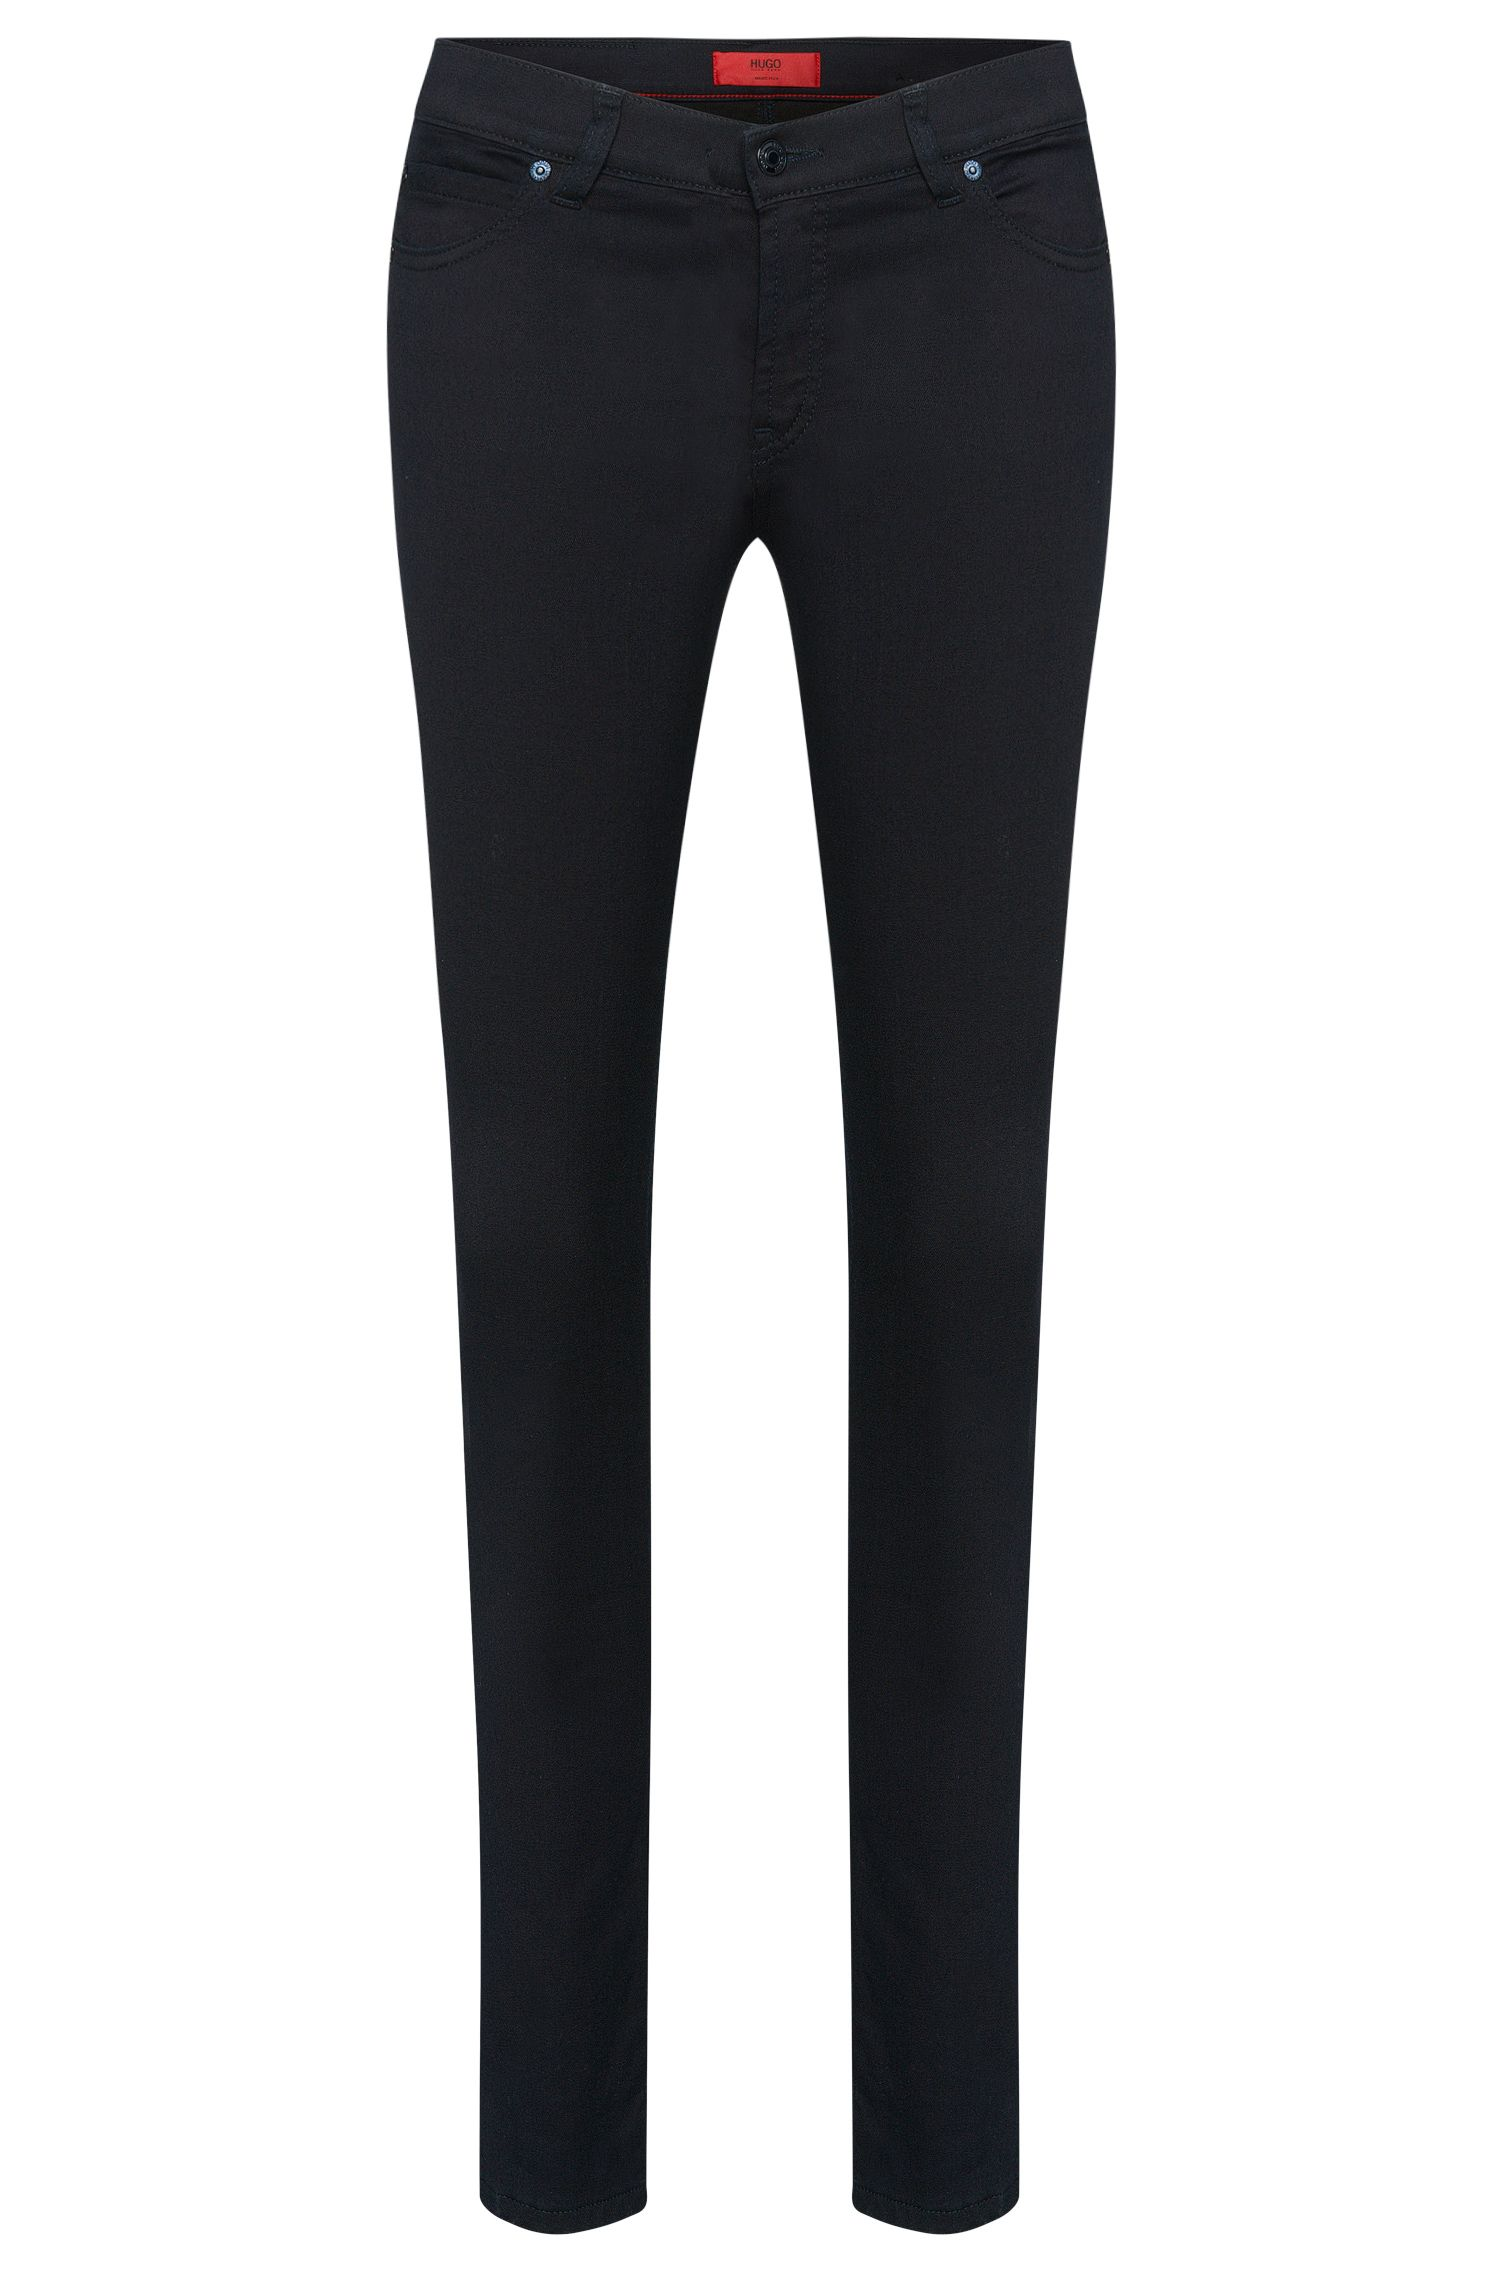 Jeans Super Skinny Fit en coton mélangé extensible: «Georgina»